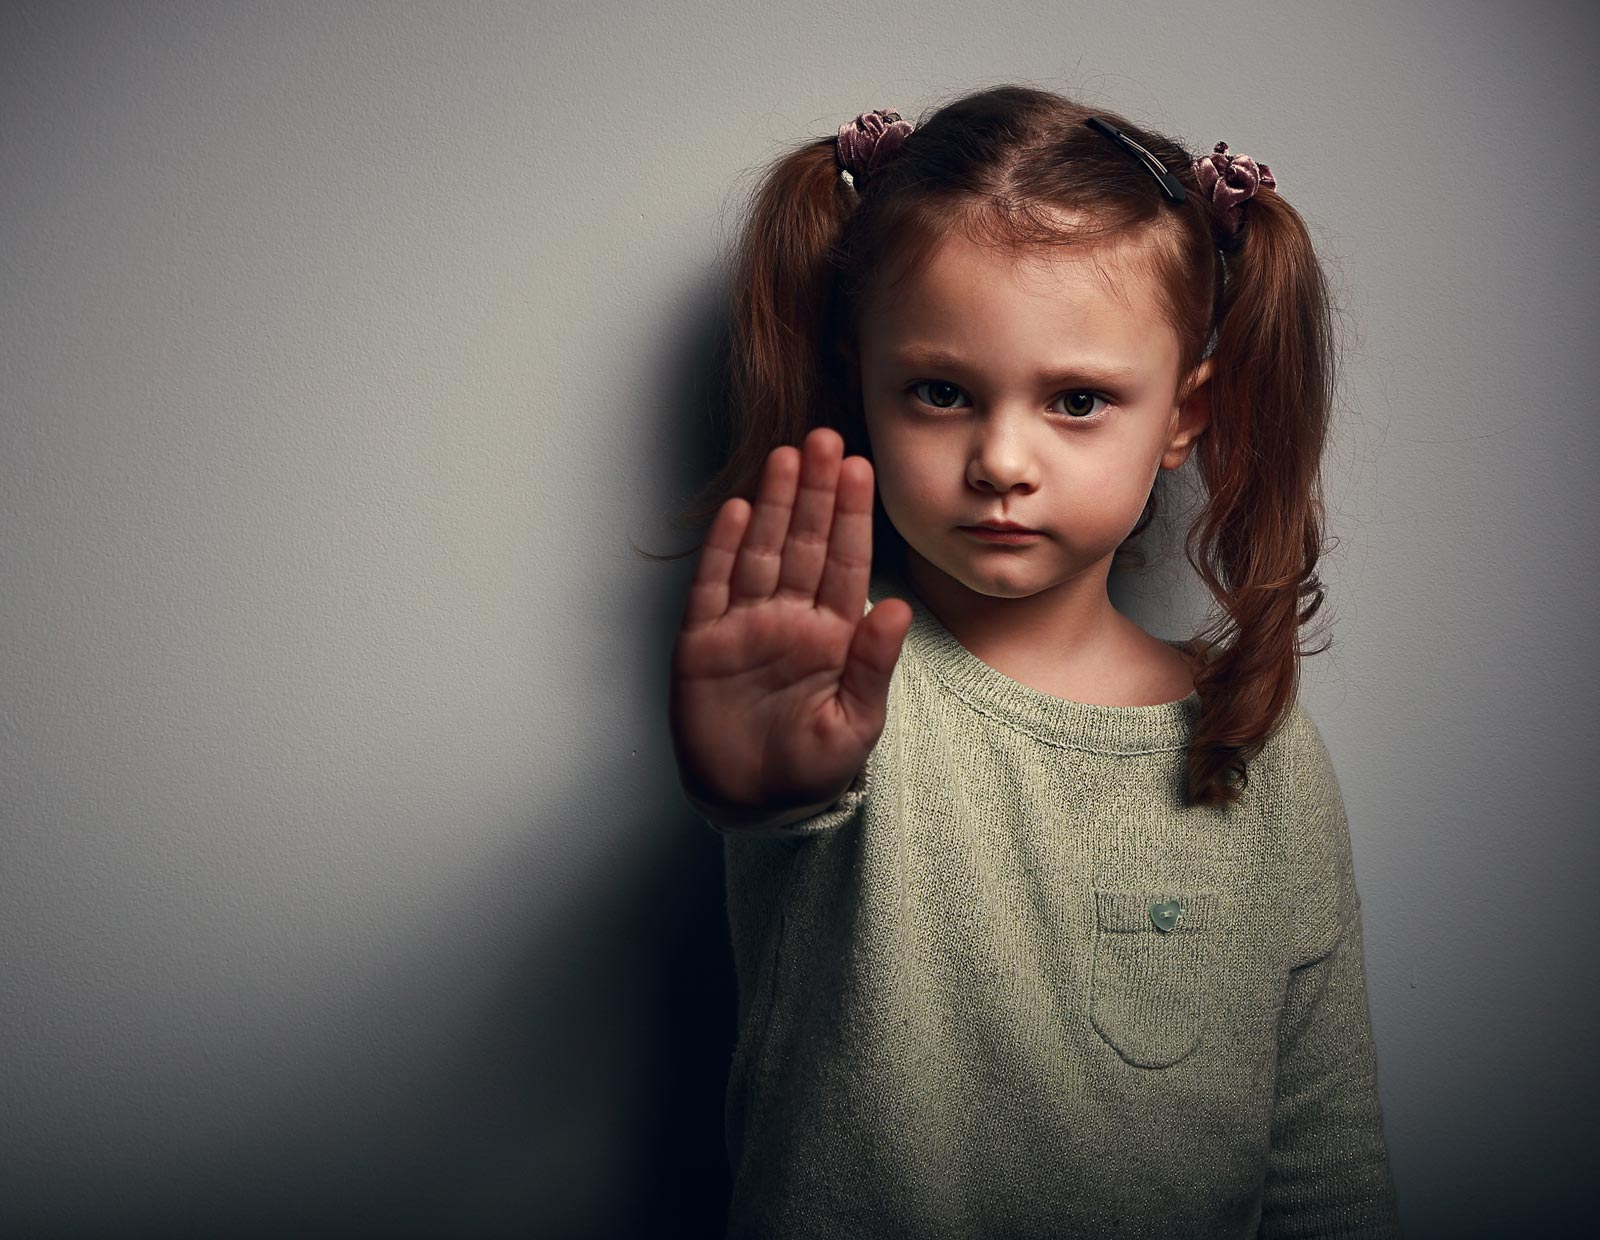 child-abuse.jpg